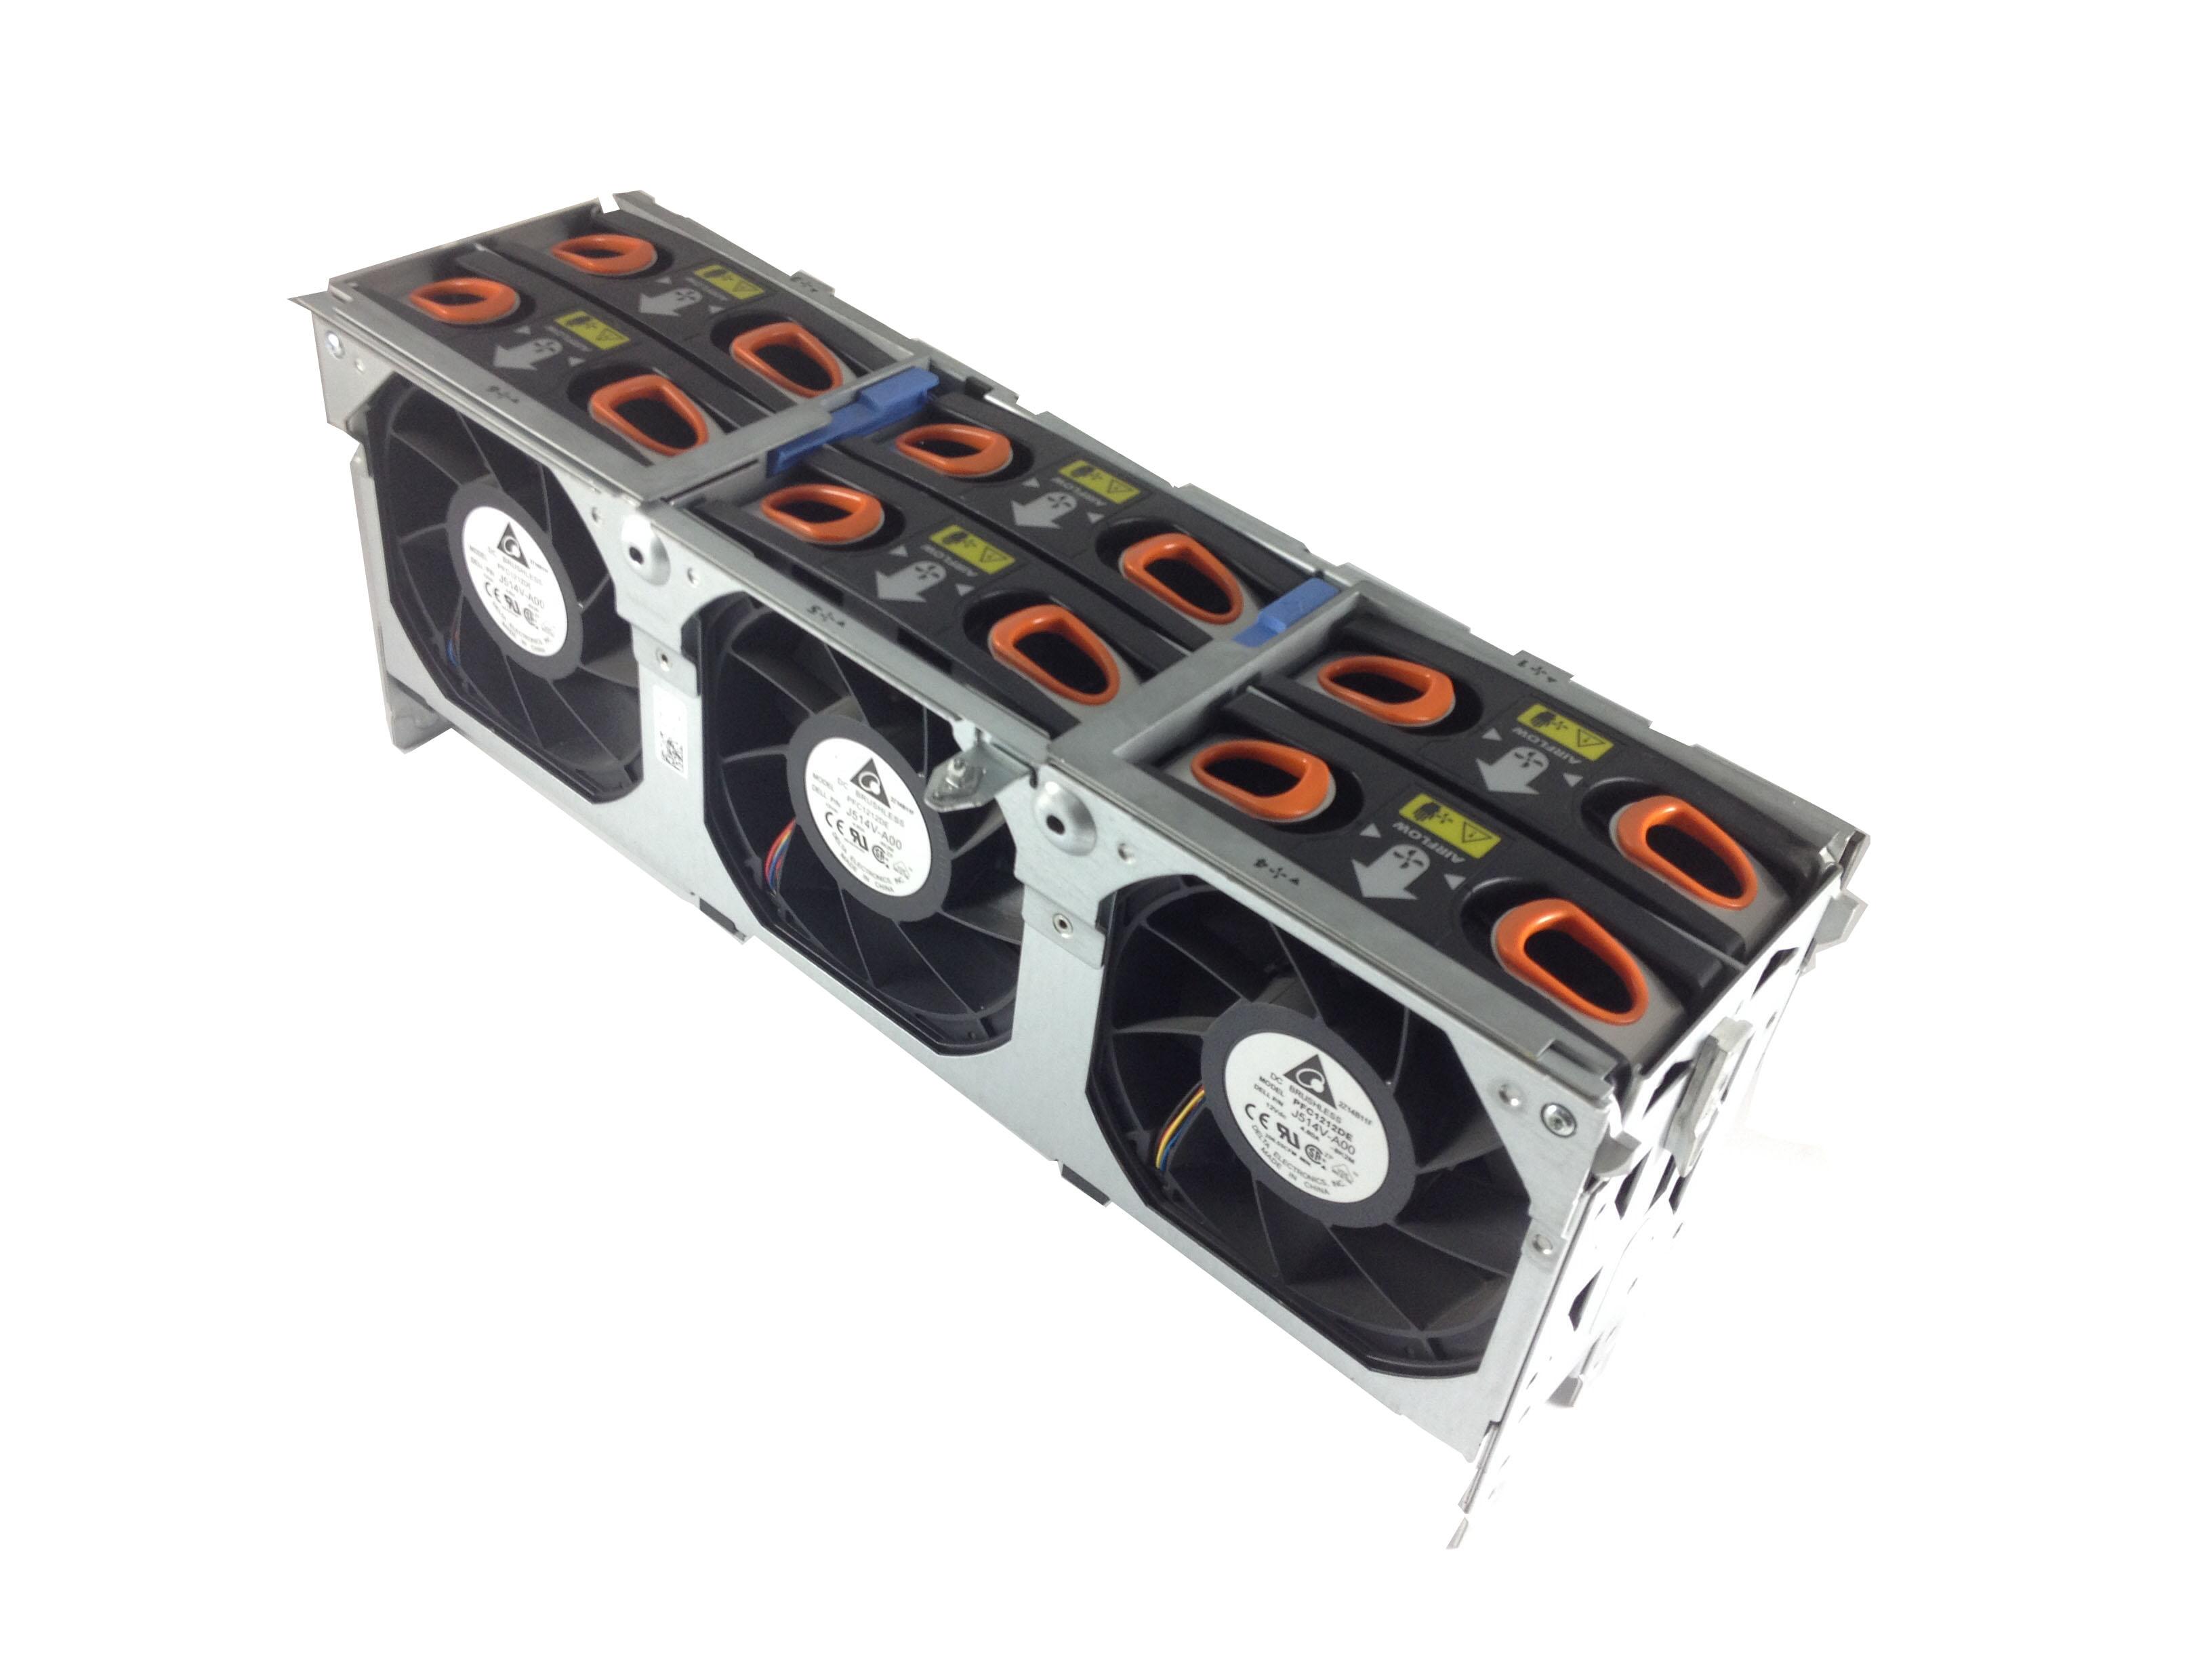 Dell PowerEdge R910 Fan Cage W / 6 Fans J514V (C211T)